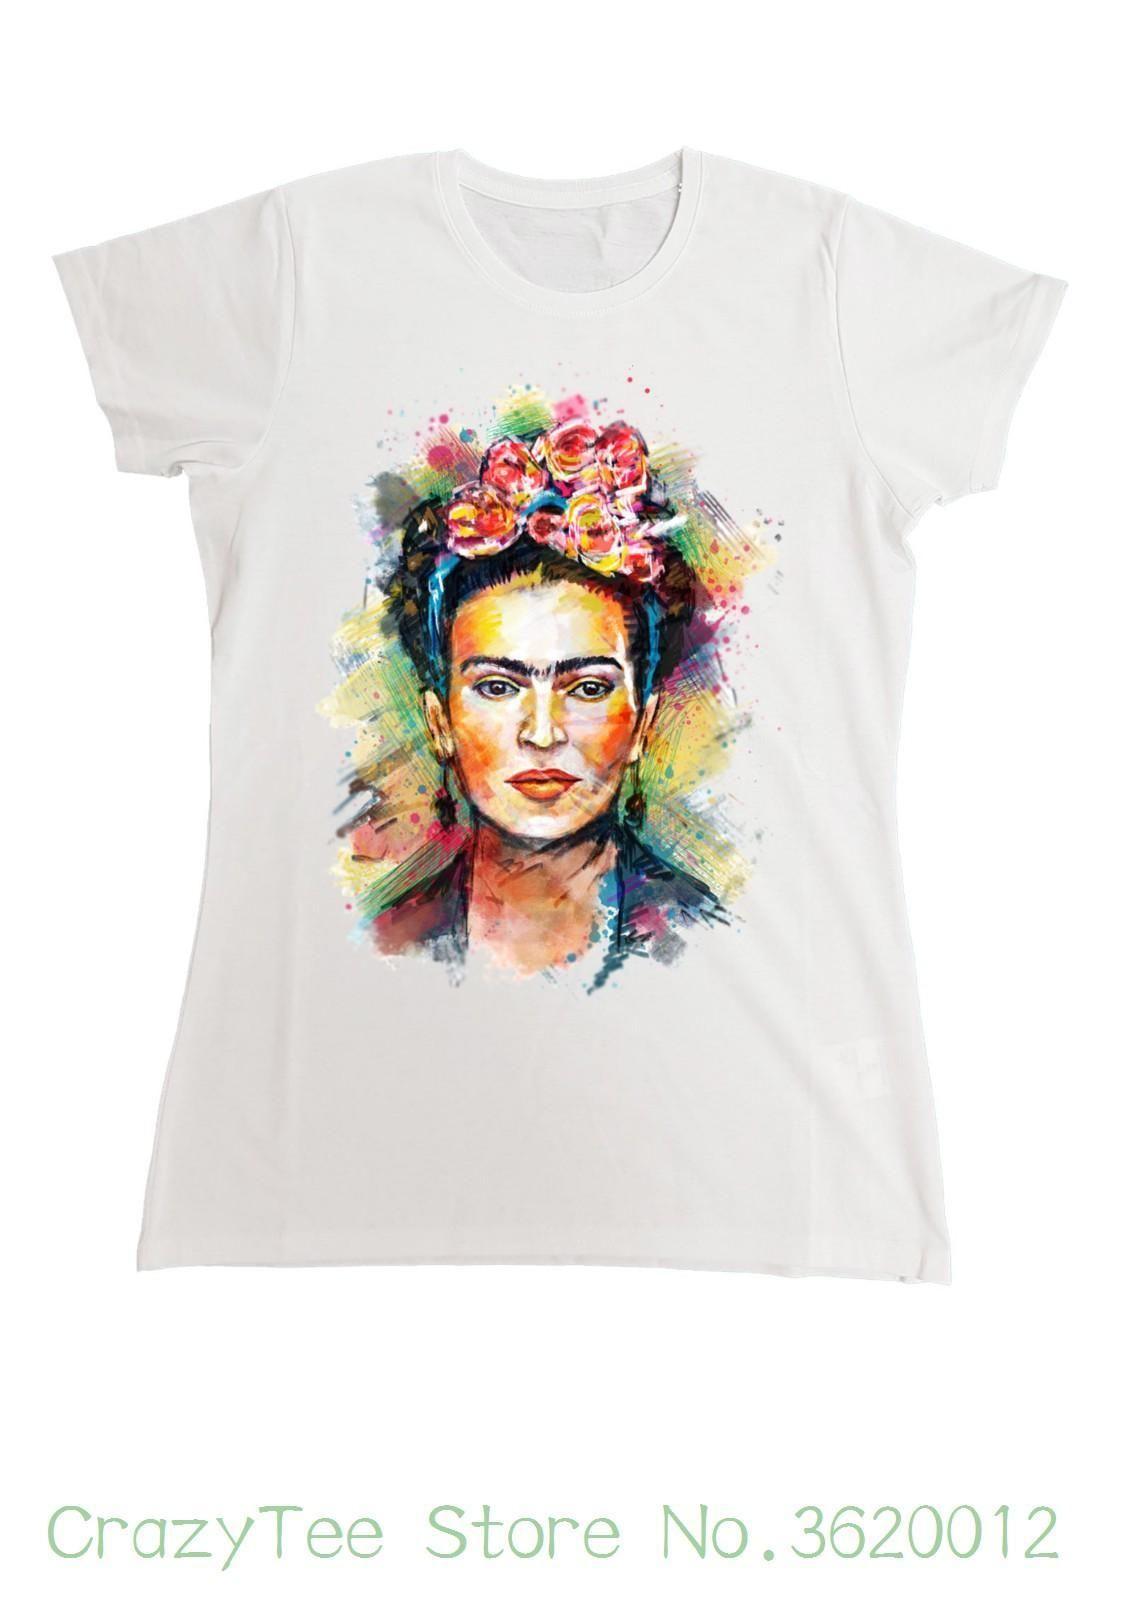 info for cedac 5eba7 Women s Tee Donna Frida Kahlo T Shirt Magietta Icona Femminista Artista Art  Cool Ladies Tees